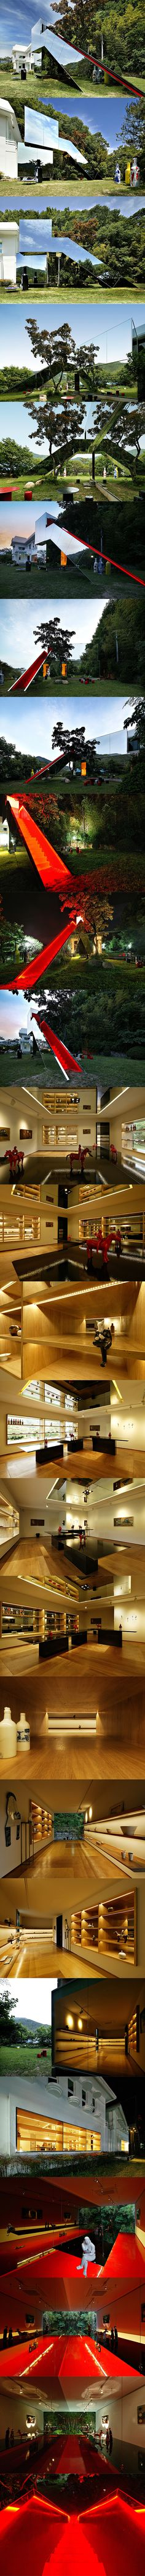 ART 23.5 Jung Gil-Young gallery Design : YOON SPACE . Yoon Seok-min (ysm7791@naver.com)  Design Team : YOON SPACE . Rita-kim  / SP R&D. Park Jung-su Location : 247Jiseul-ri,Gakbuk-myeon,Cheongdo-gun,Gyeongsangbuk-do, Korea Function : Gallery Finish : Floor/Plywood, Epoxy , Wal/Wallpaper, Mirror, Glass , Ceiling/Wallpaper,Mirror Built Area : 115m2 Construction : SP R&D. Park Jung-su Photographs : Indiphos .Song Gi-myoun